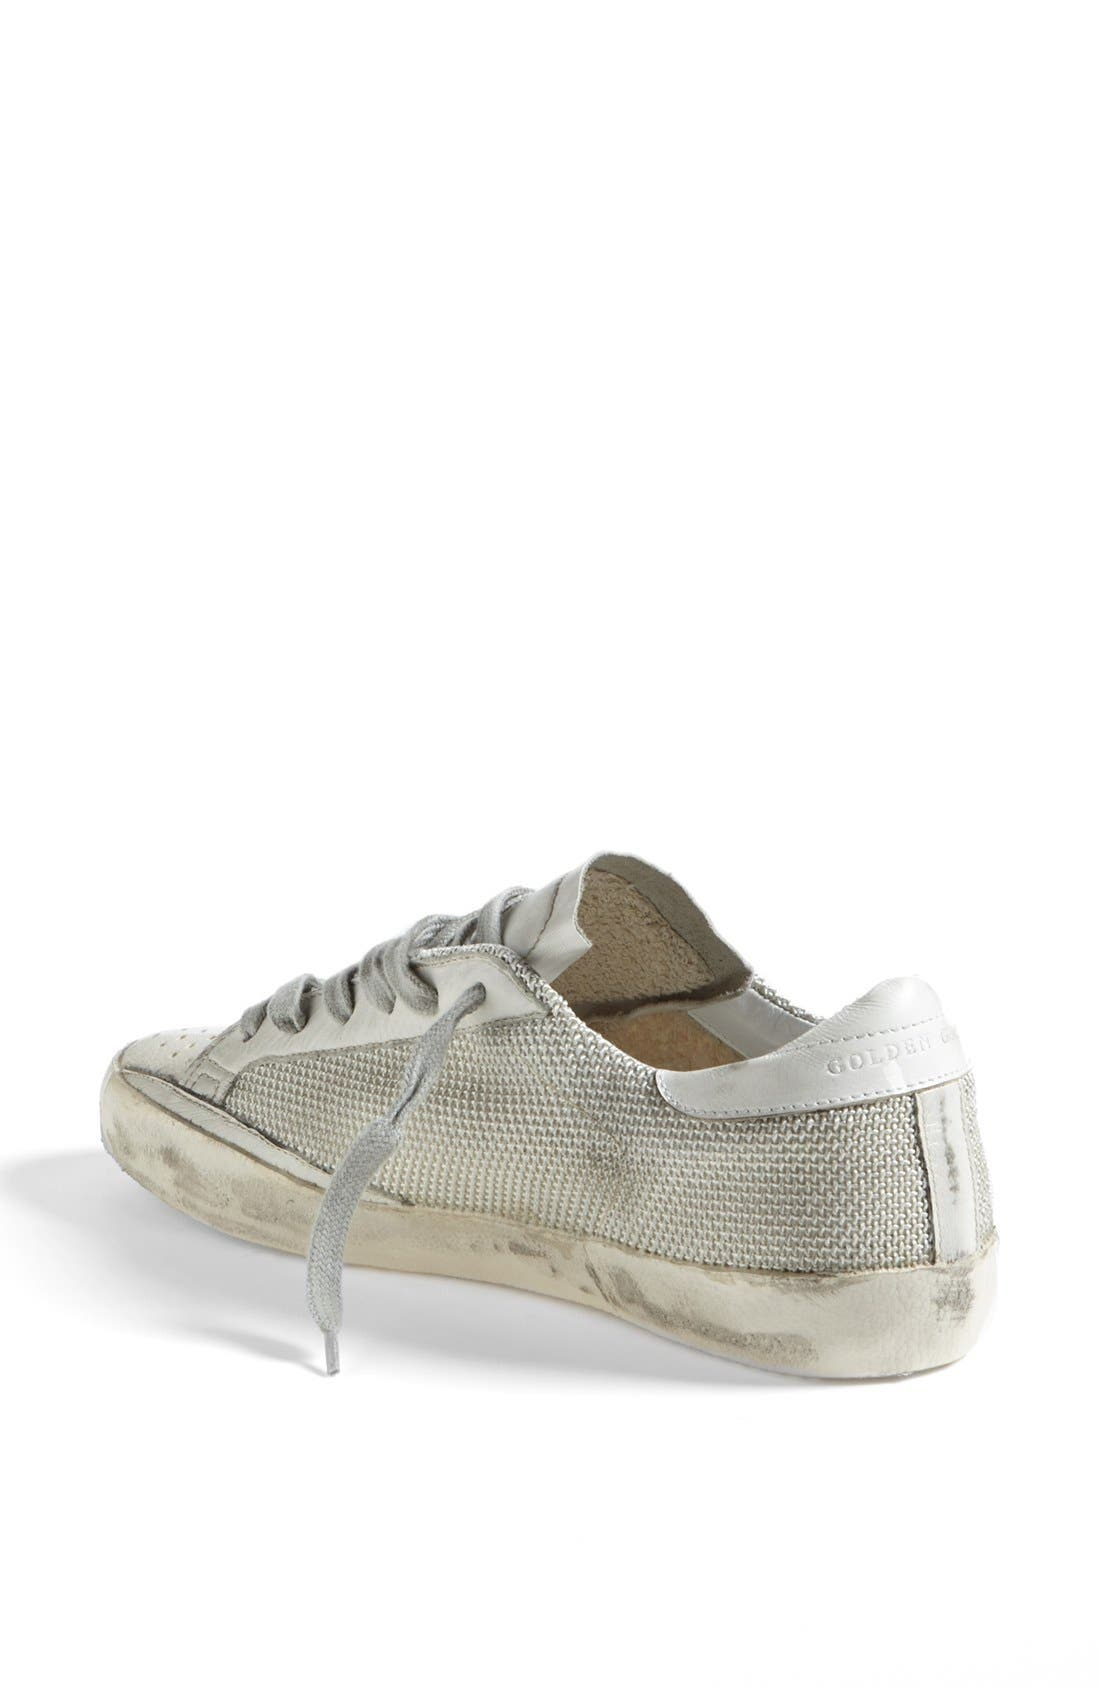 Alternate Image 3  - Golden Goose 'Superstar' Sneaker